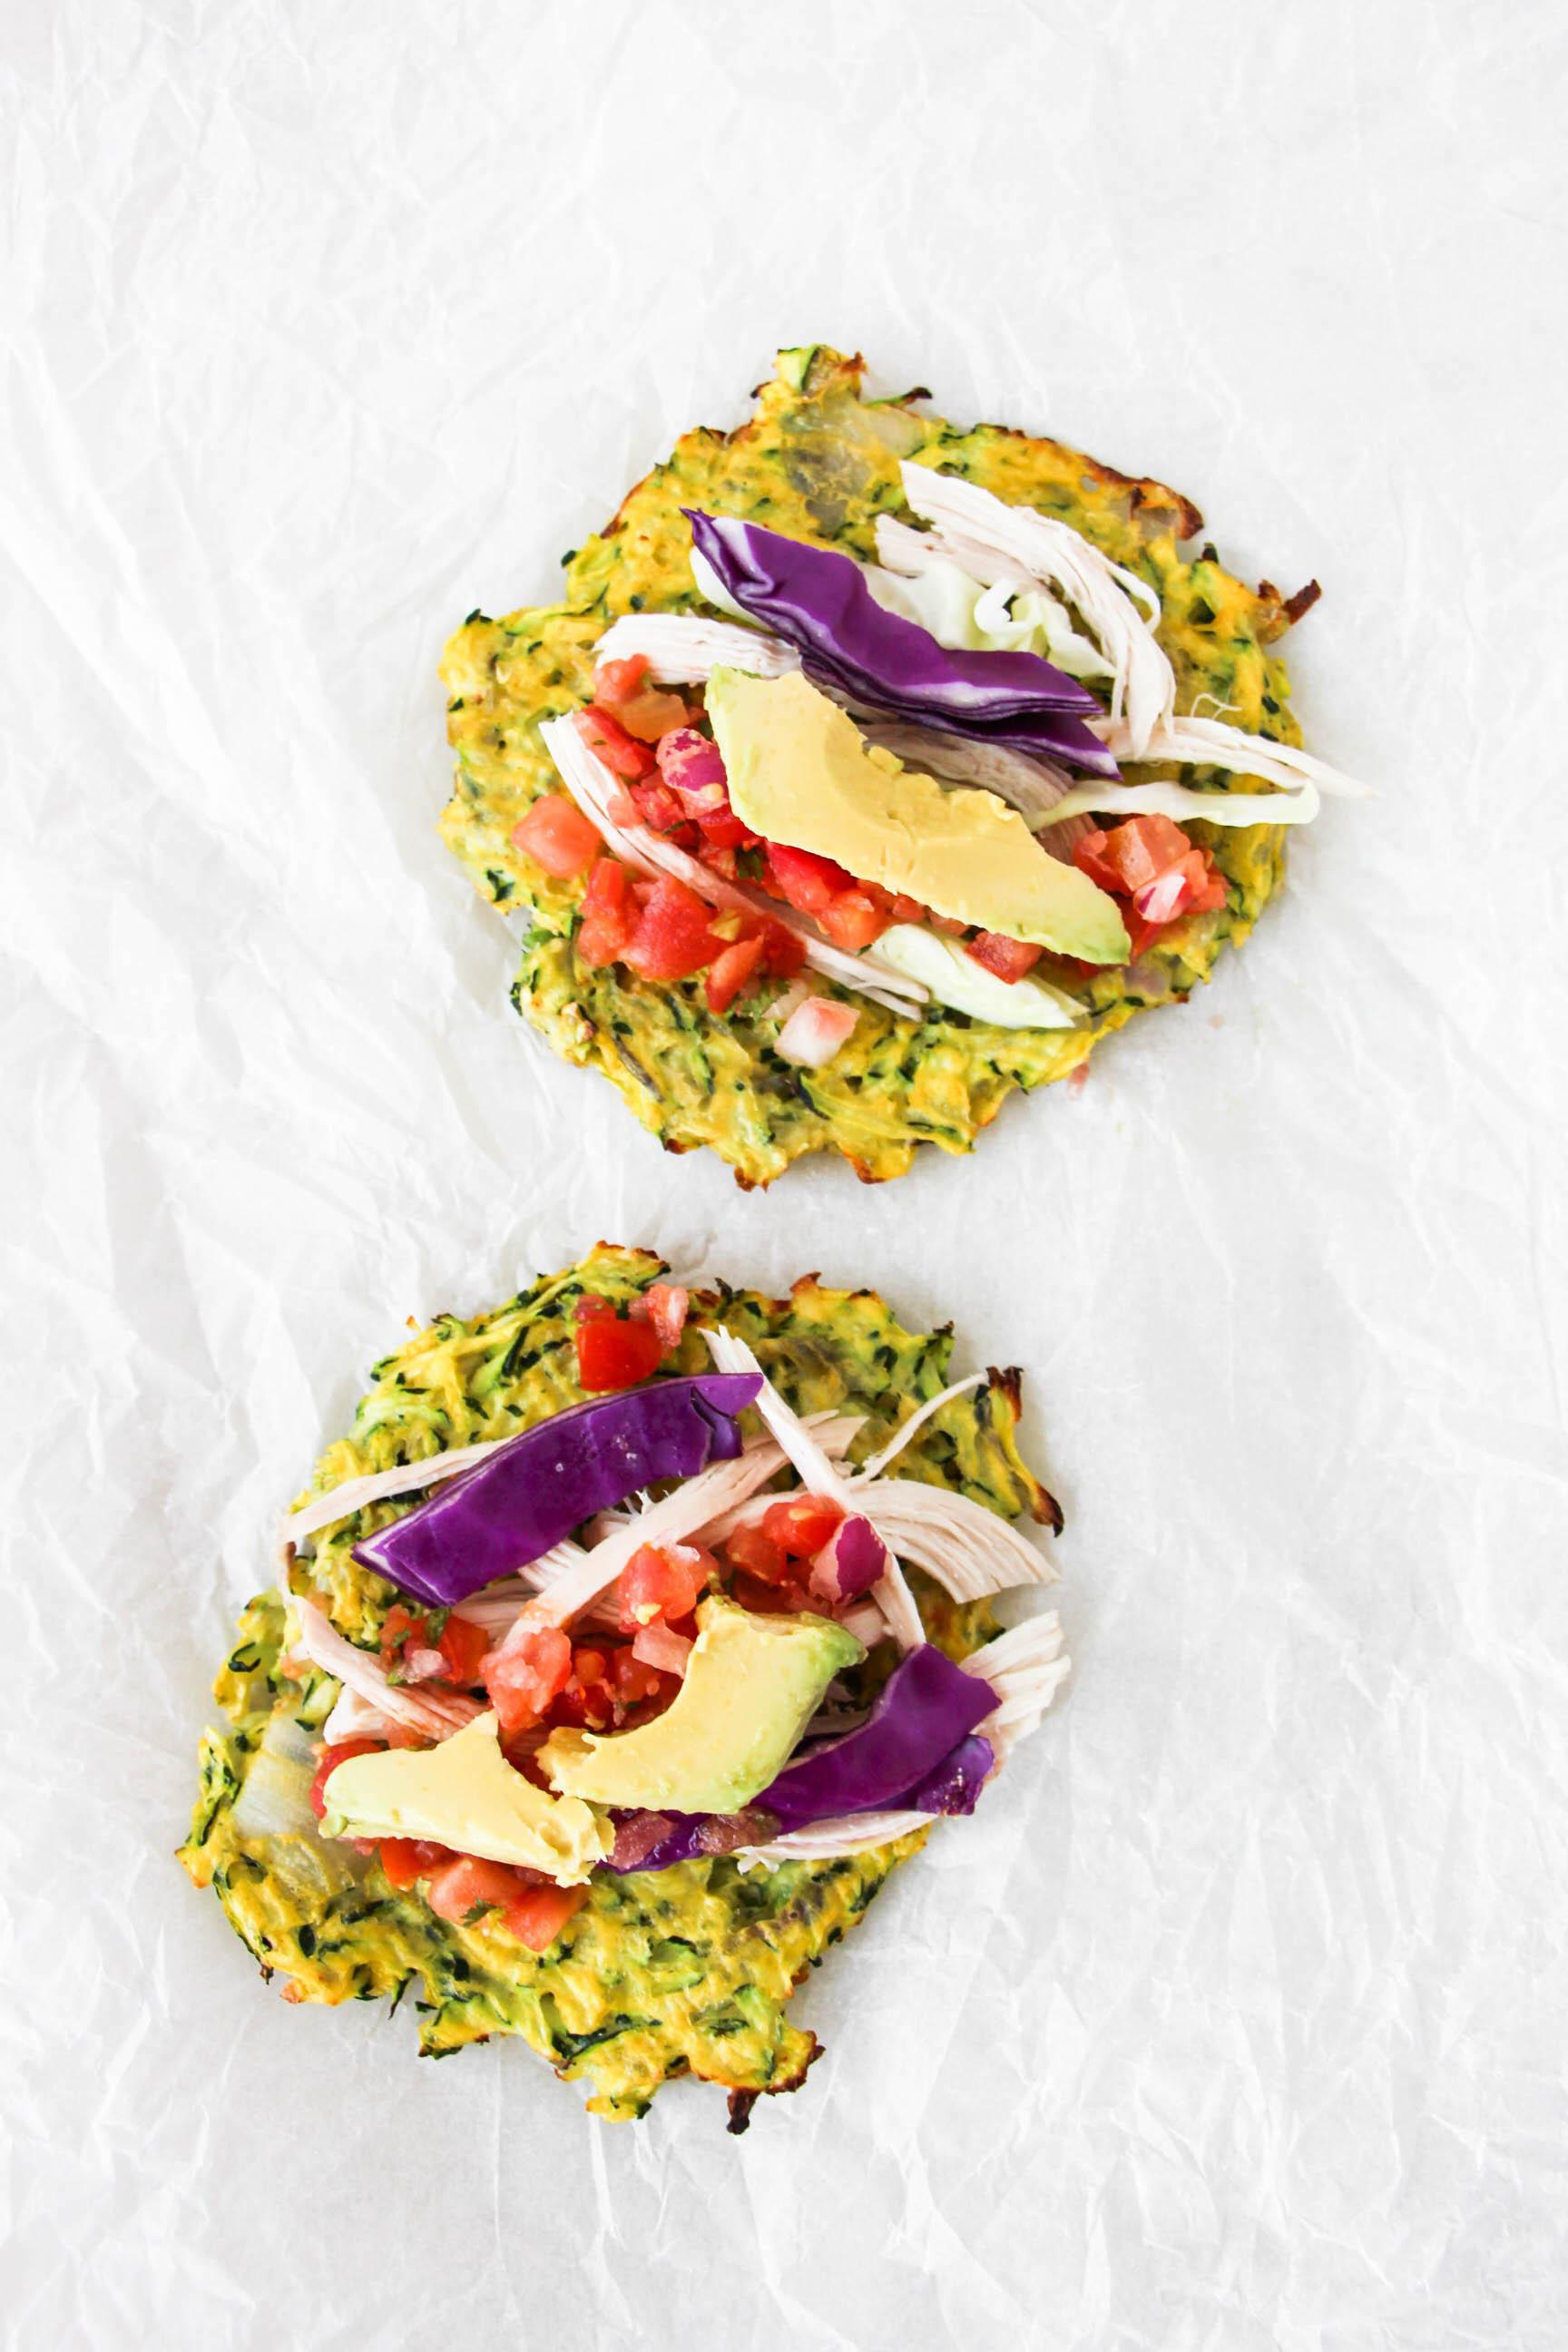 zucchini-tortillas-ShiraRD-paleo-refinedsugarfree-SnacksbyShira-1.jpg